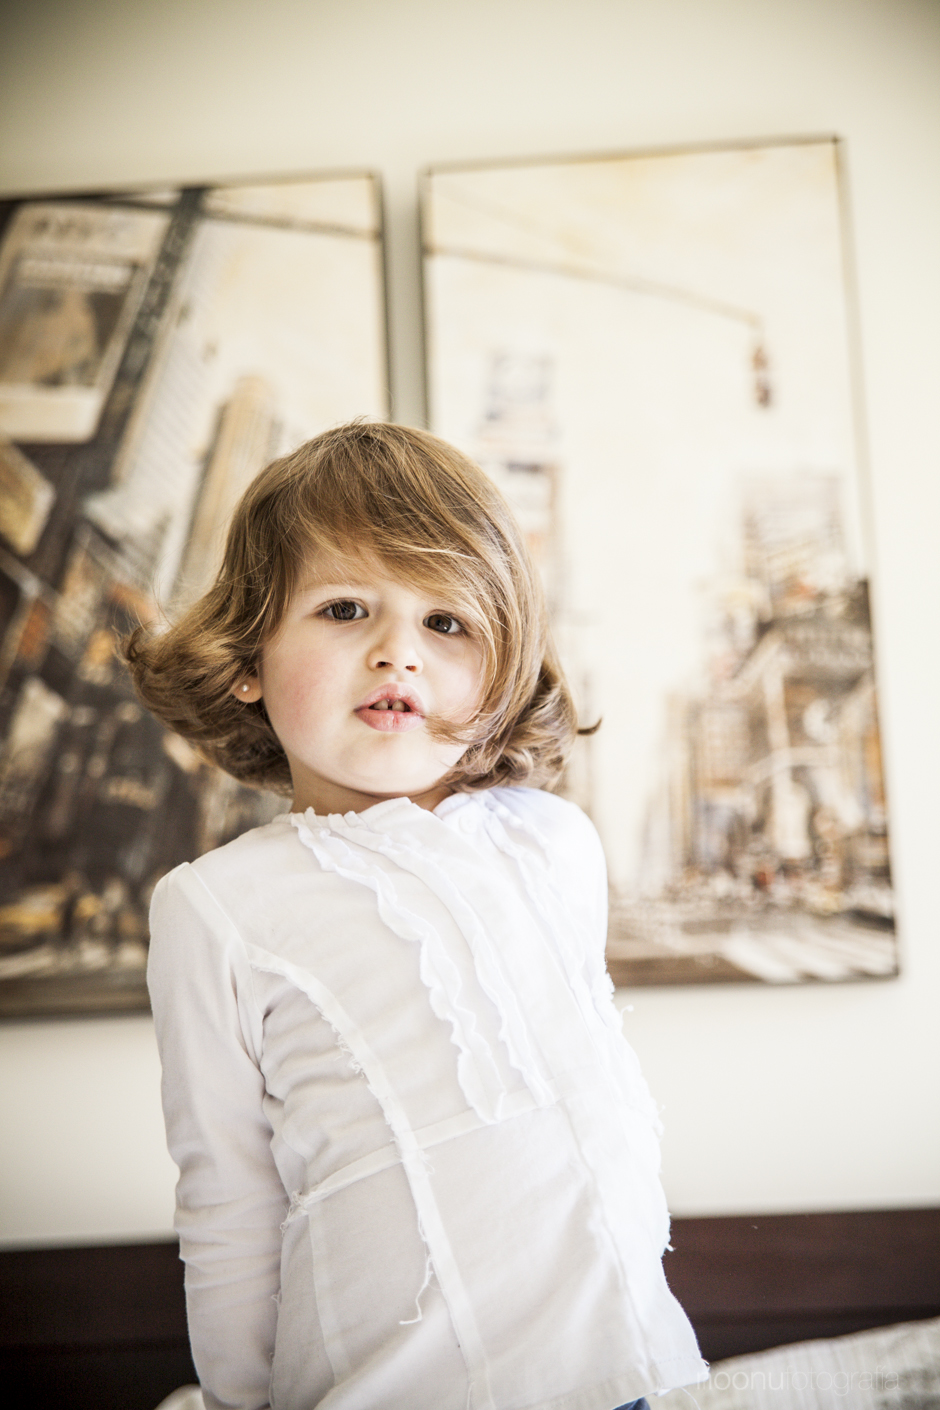 Noonu-fotografo-de-familia-madrid-Marta 23